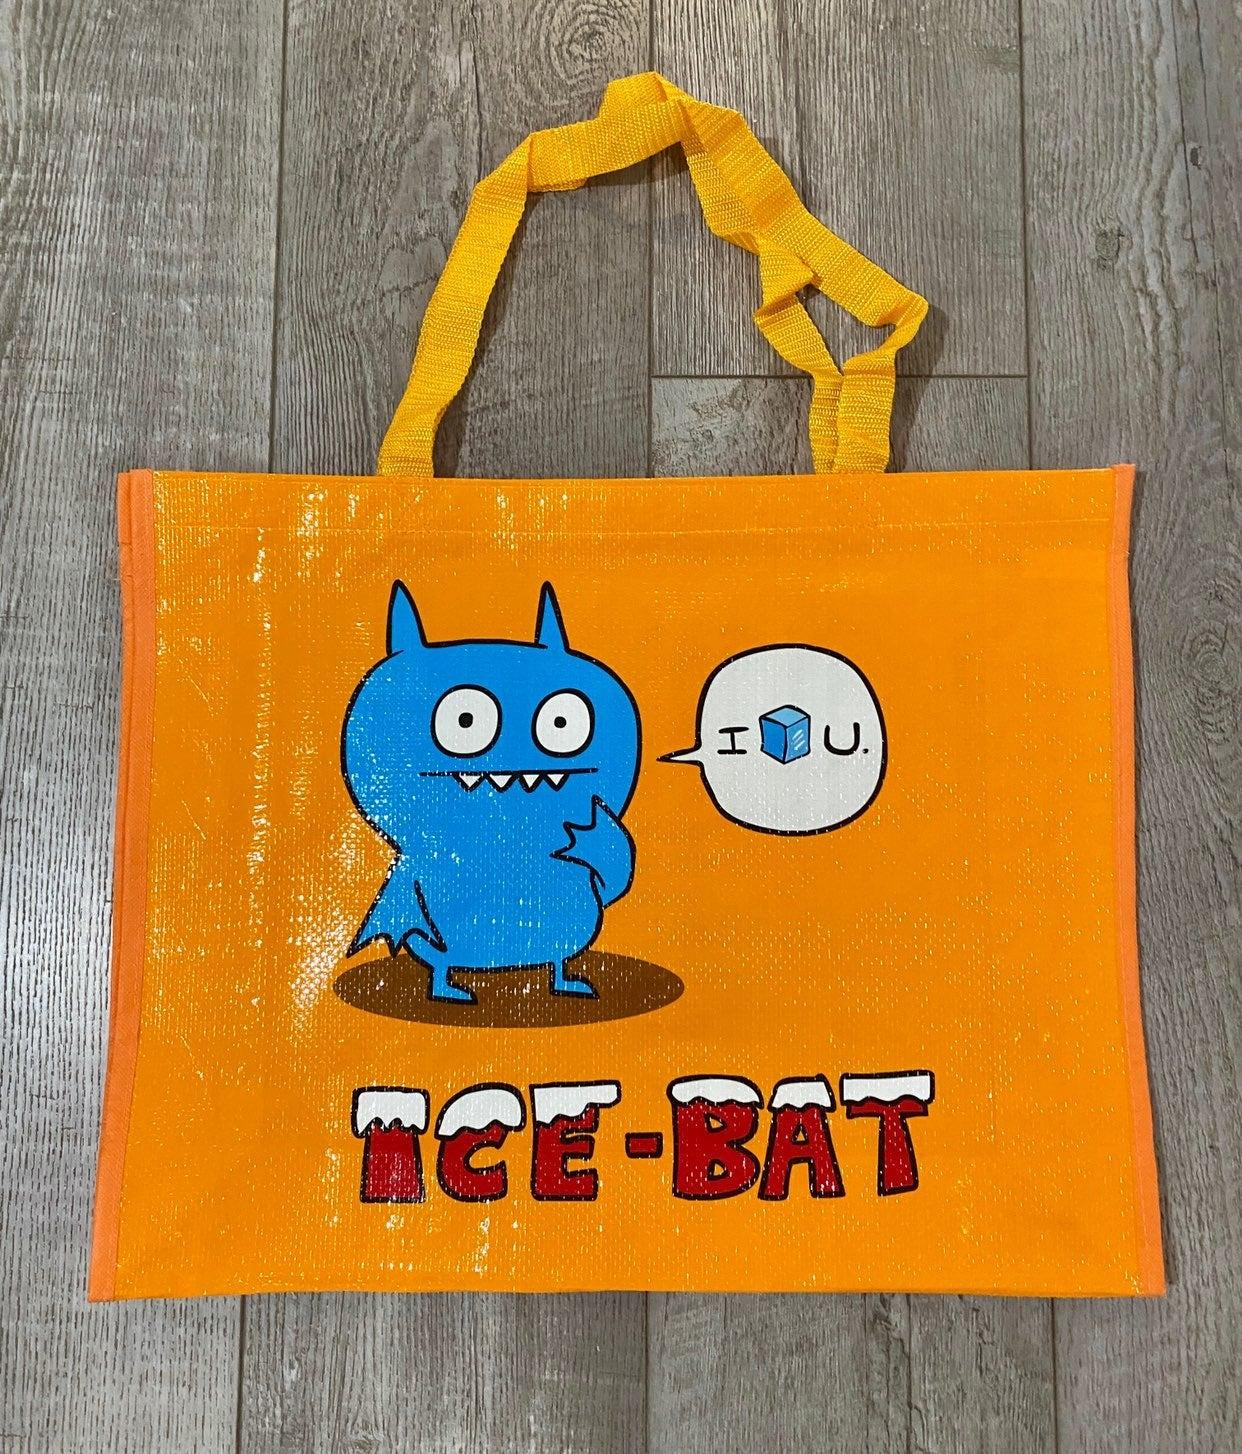 Orange Uglydoll Tote bag with Ice-Bat